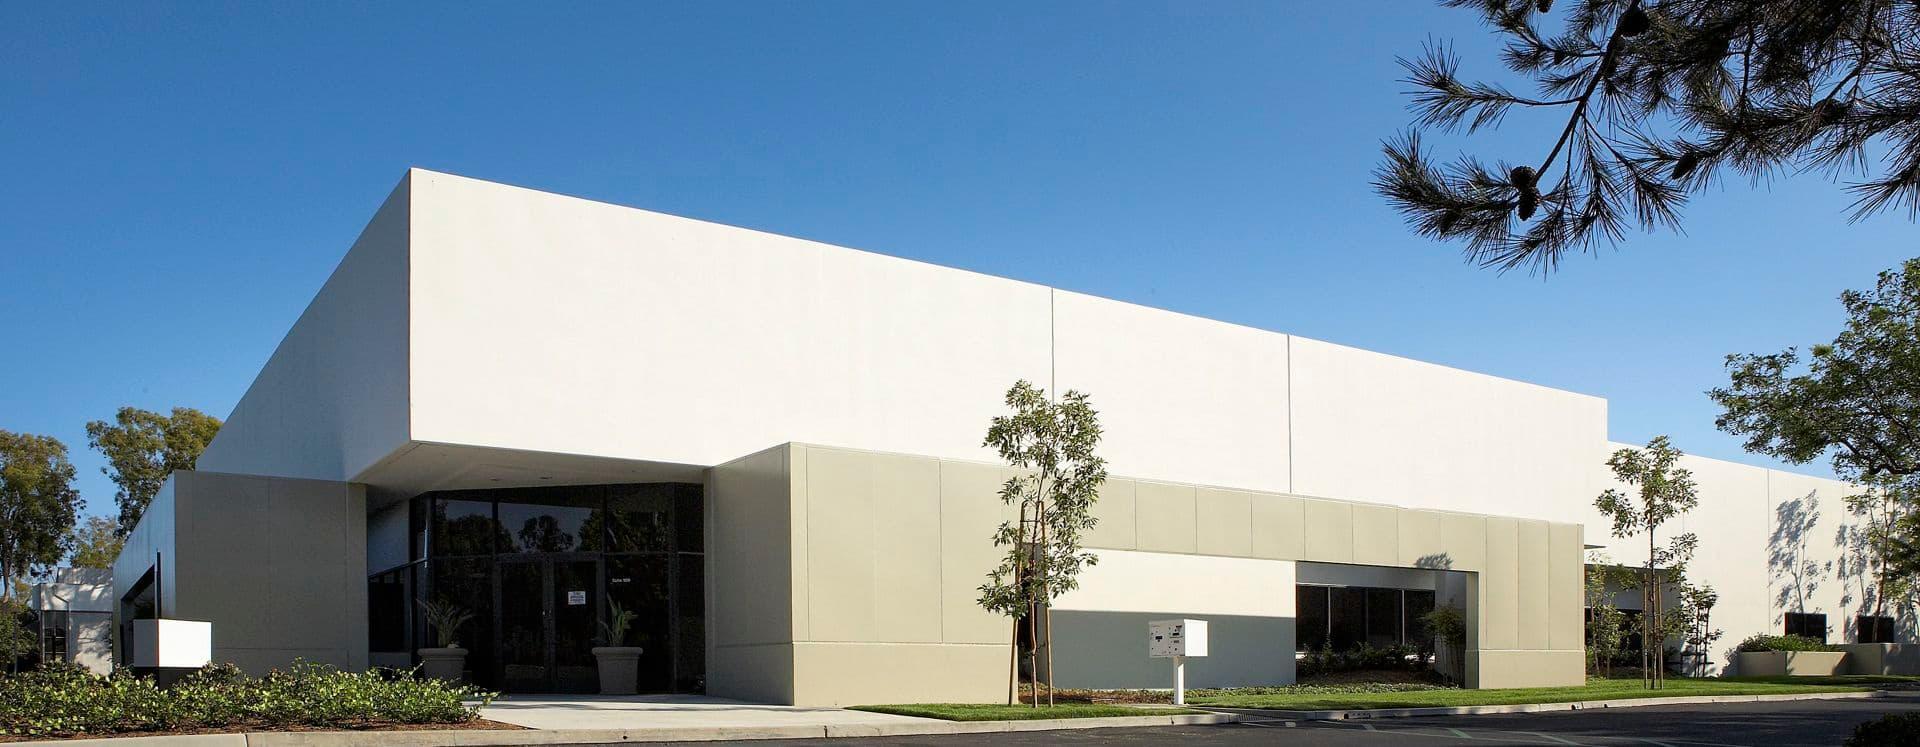 General views of 2802 Kelvin Office building. RMA Photography 2009.